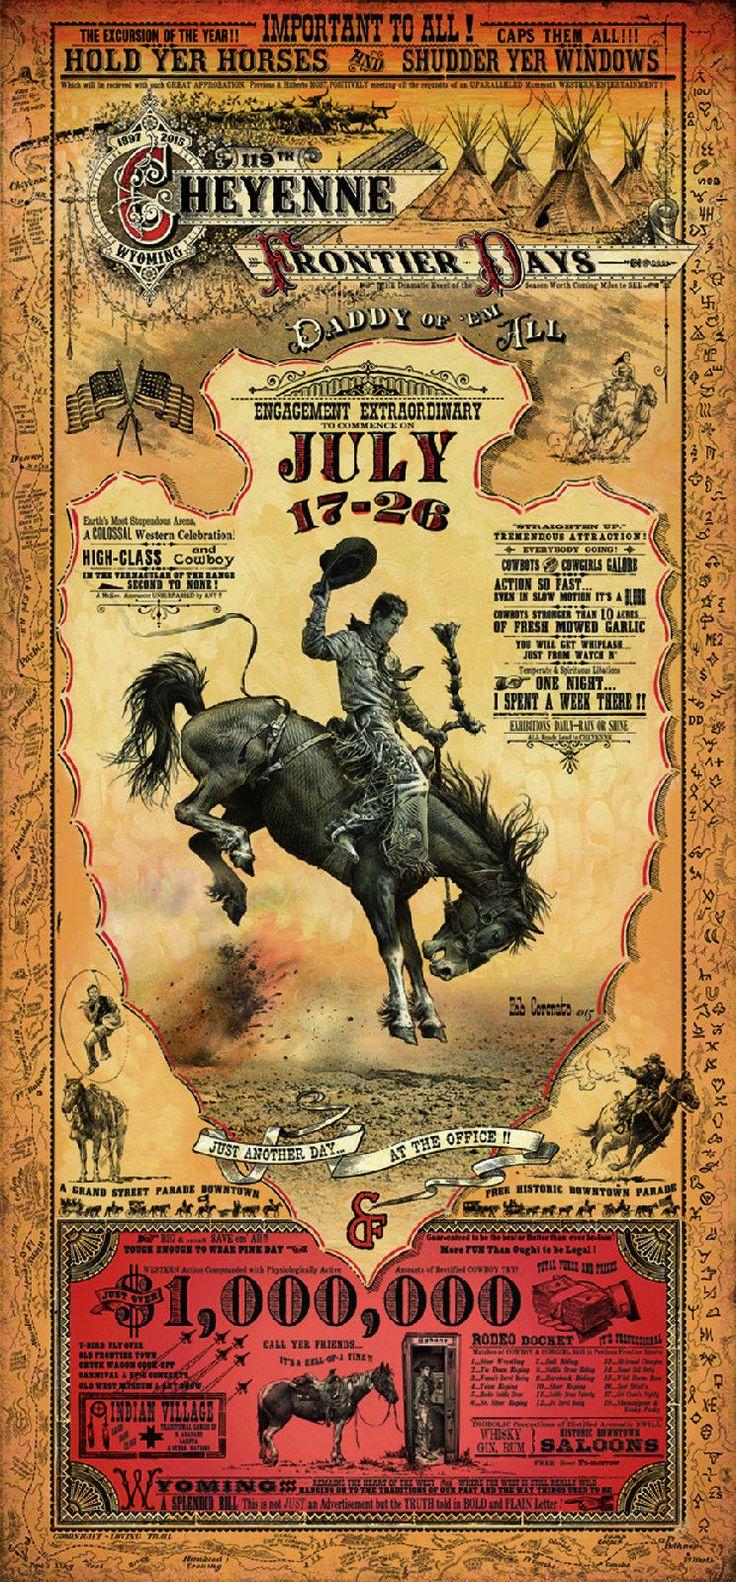 Rppc Chuck Wagon Cheyenne Wyoming Frontier Days 1920s